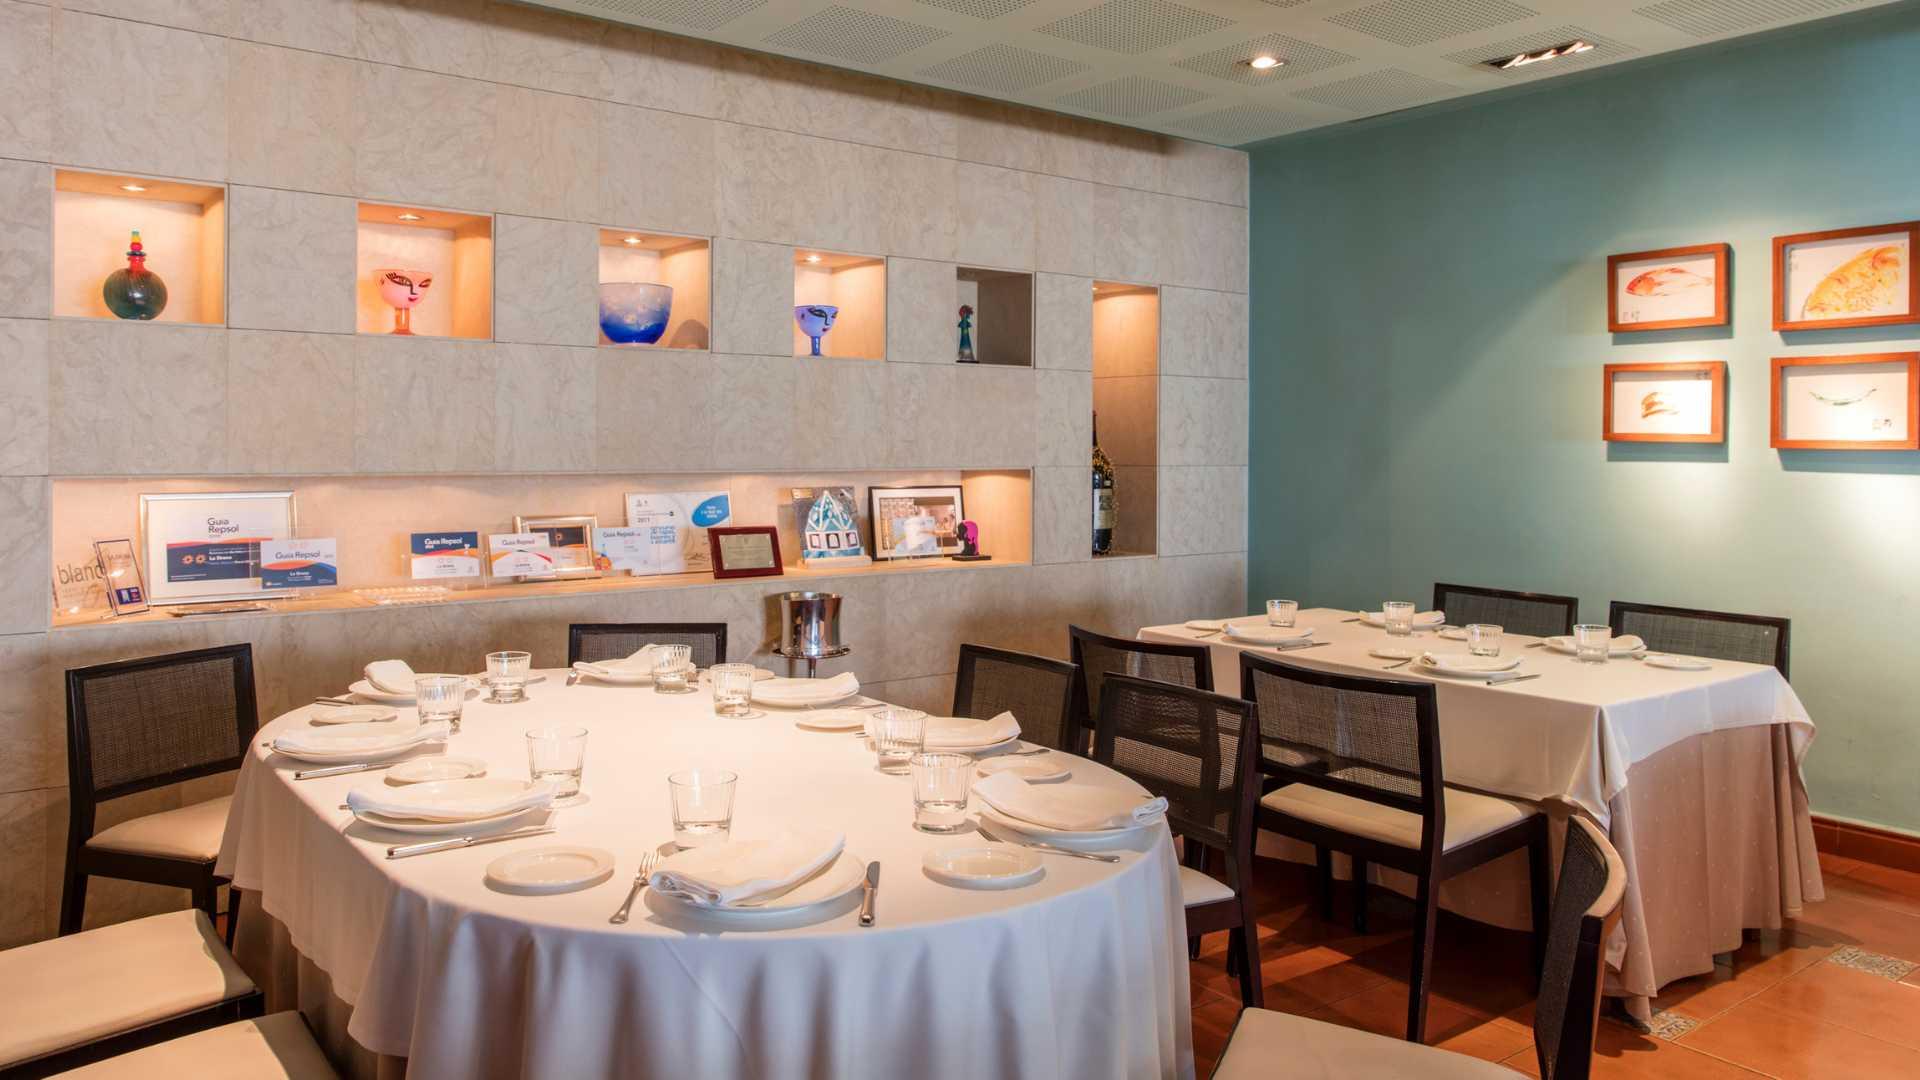 restaurante la sirena alicante